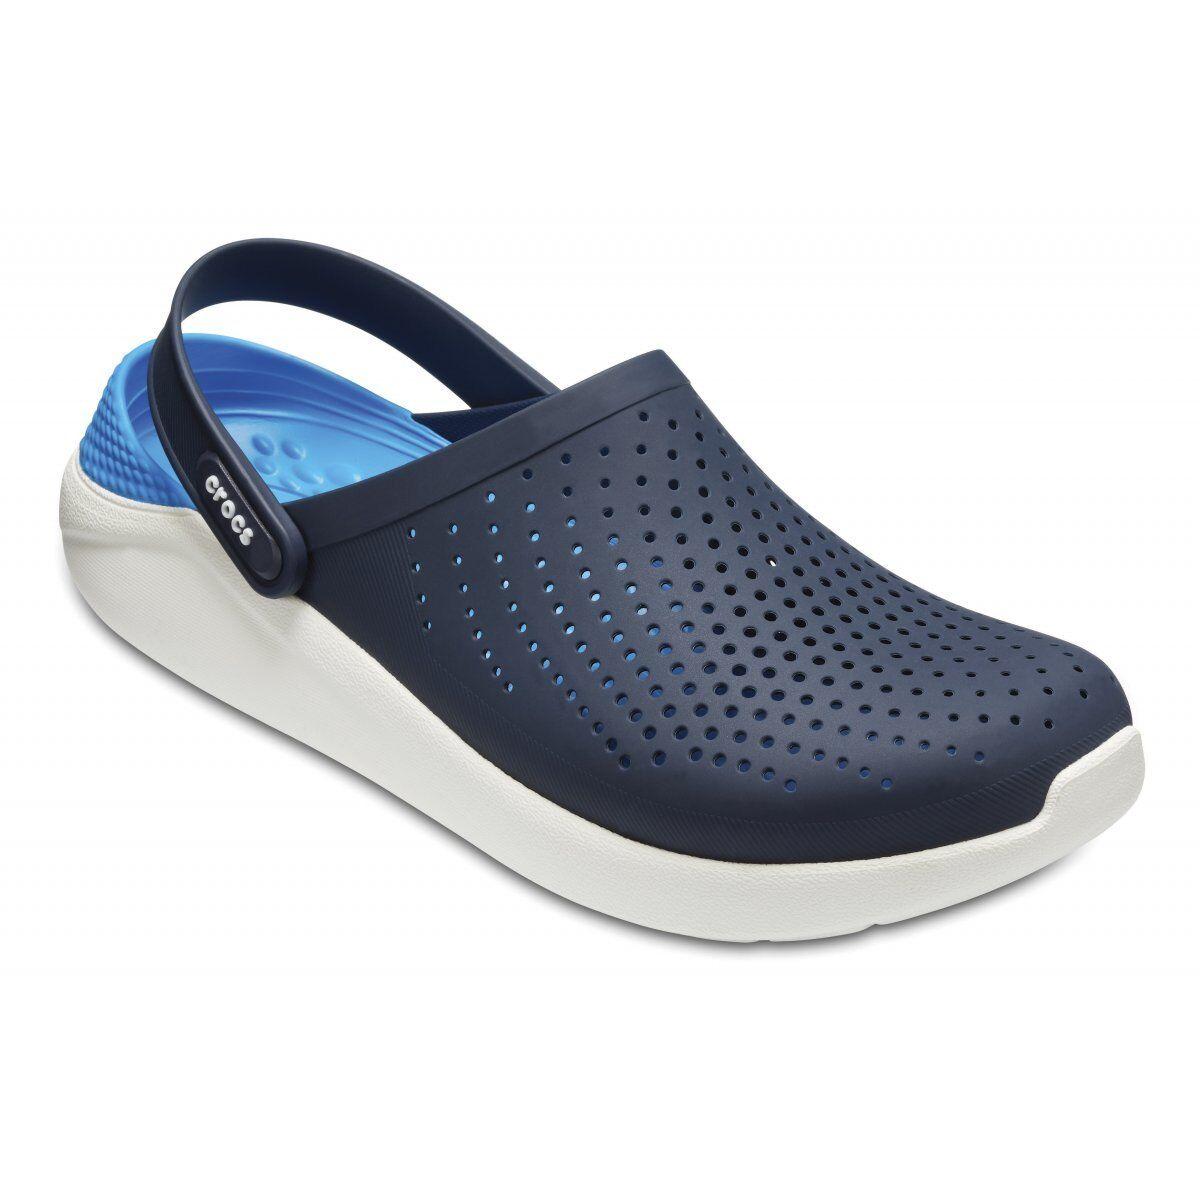 NEW Crocs  Lite Ride Relax Fit Clog scarpe Sandals Navy  bianca 204592 -462  liquidazione